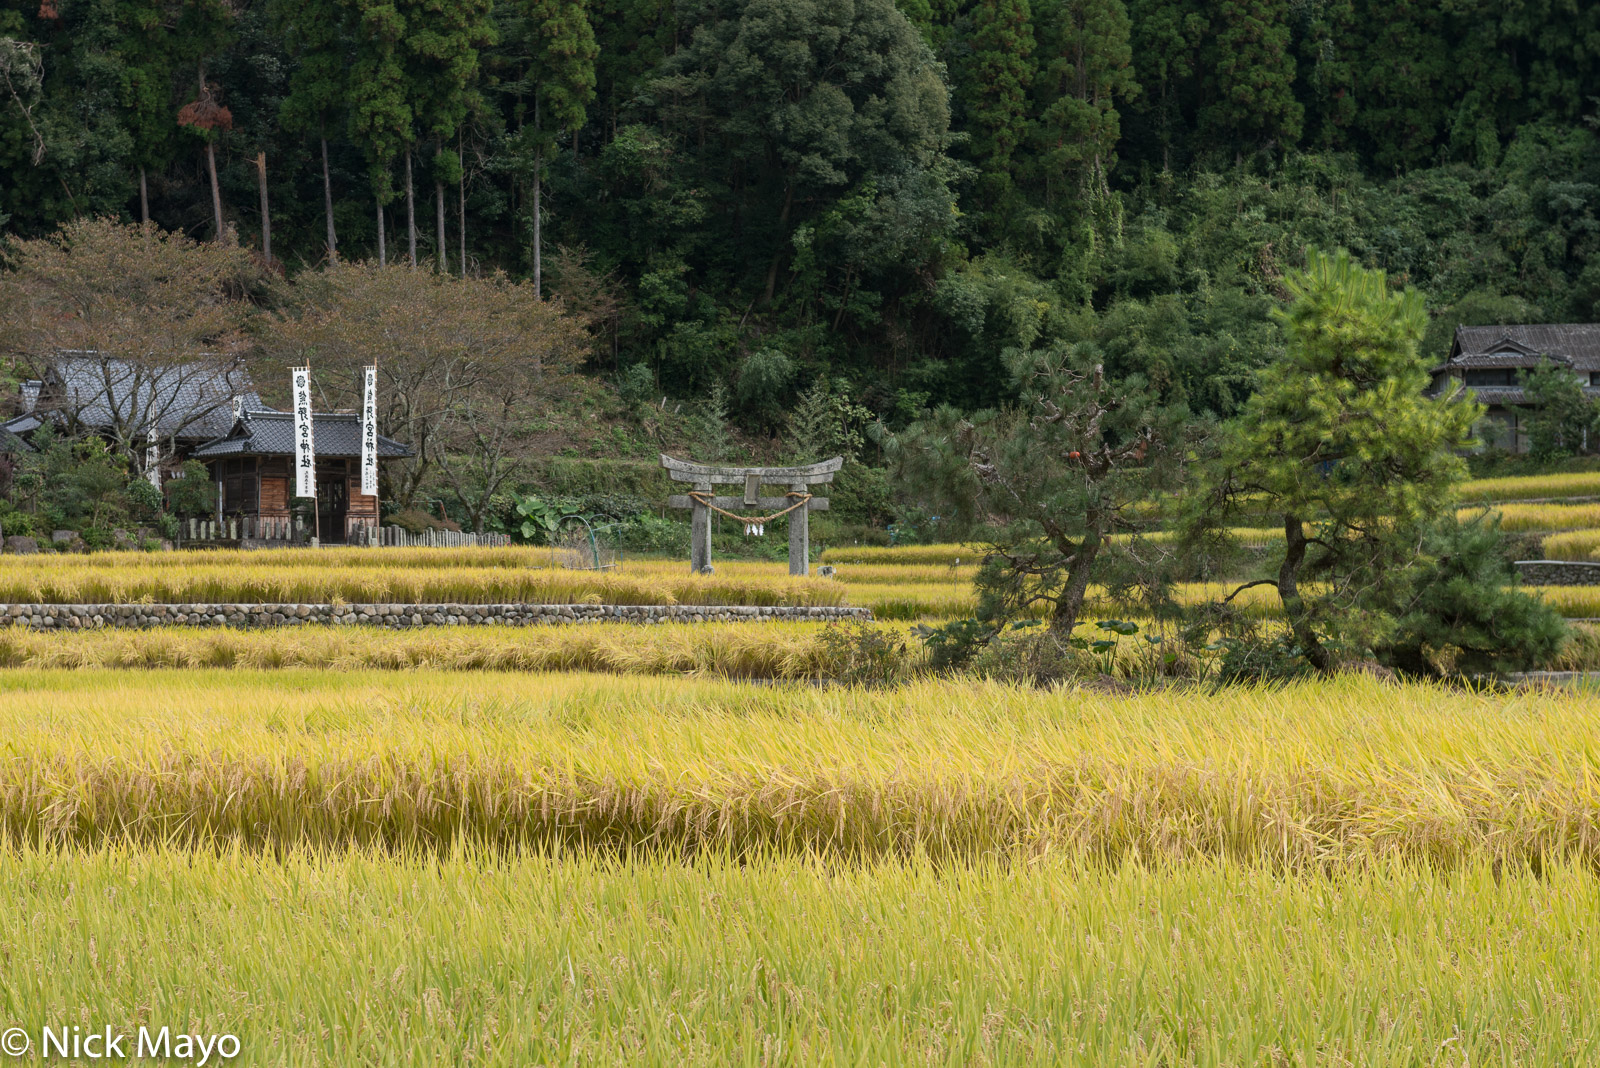 Japan,Kyushu,Paddy,Torii Gate, photo